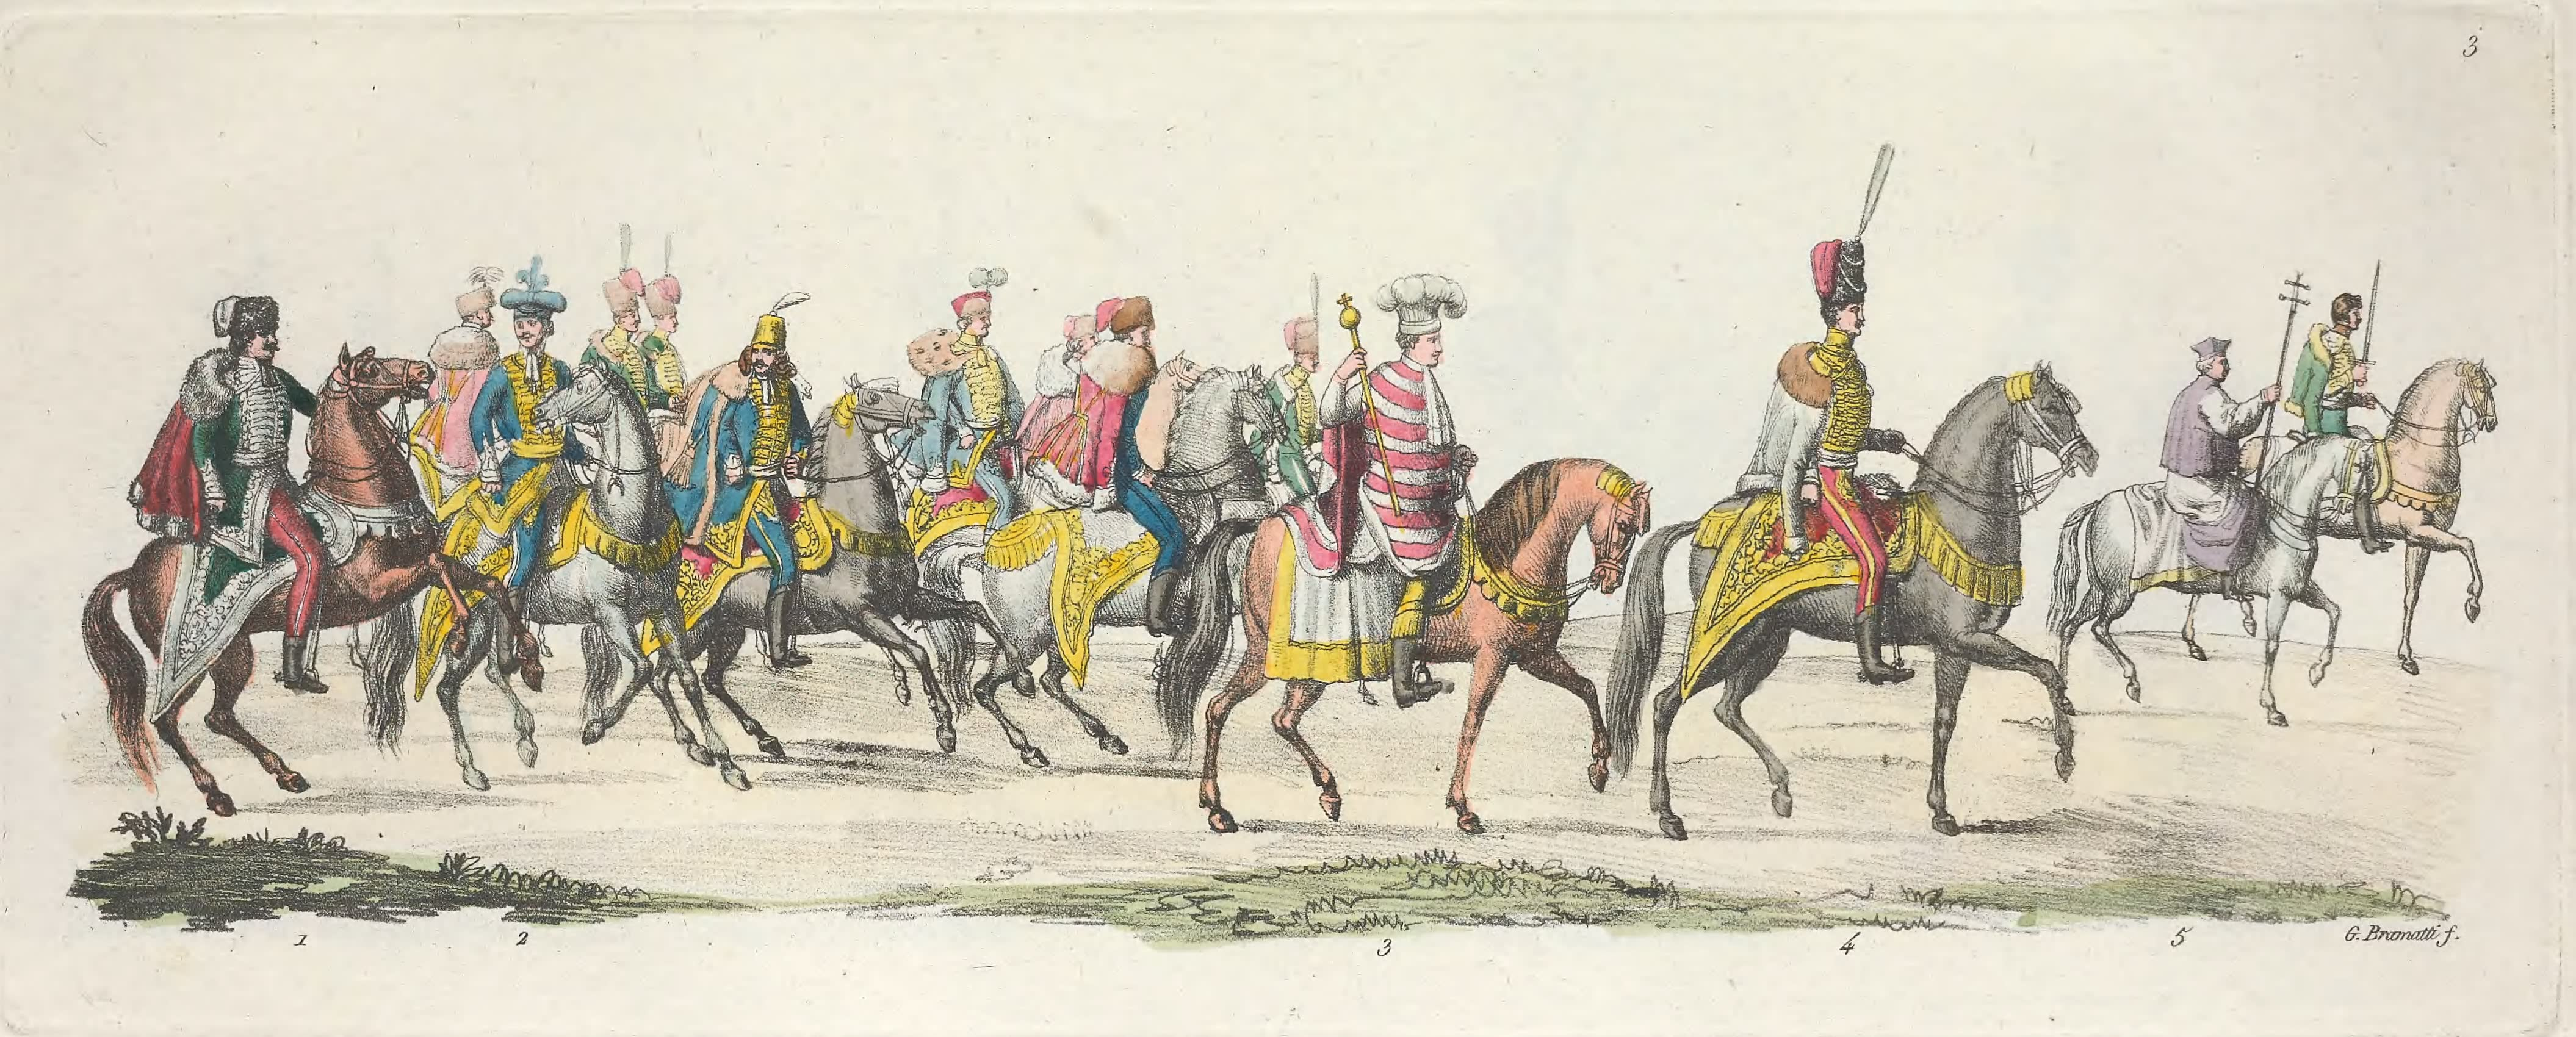 III. Magnats, Heraut, Archidue Palatin etc.